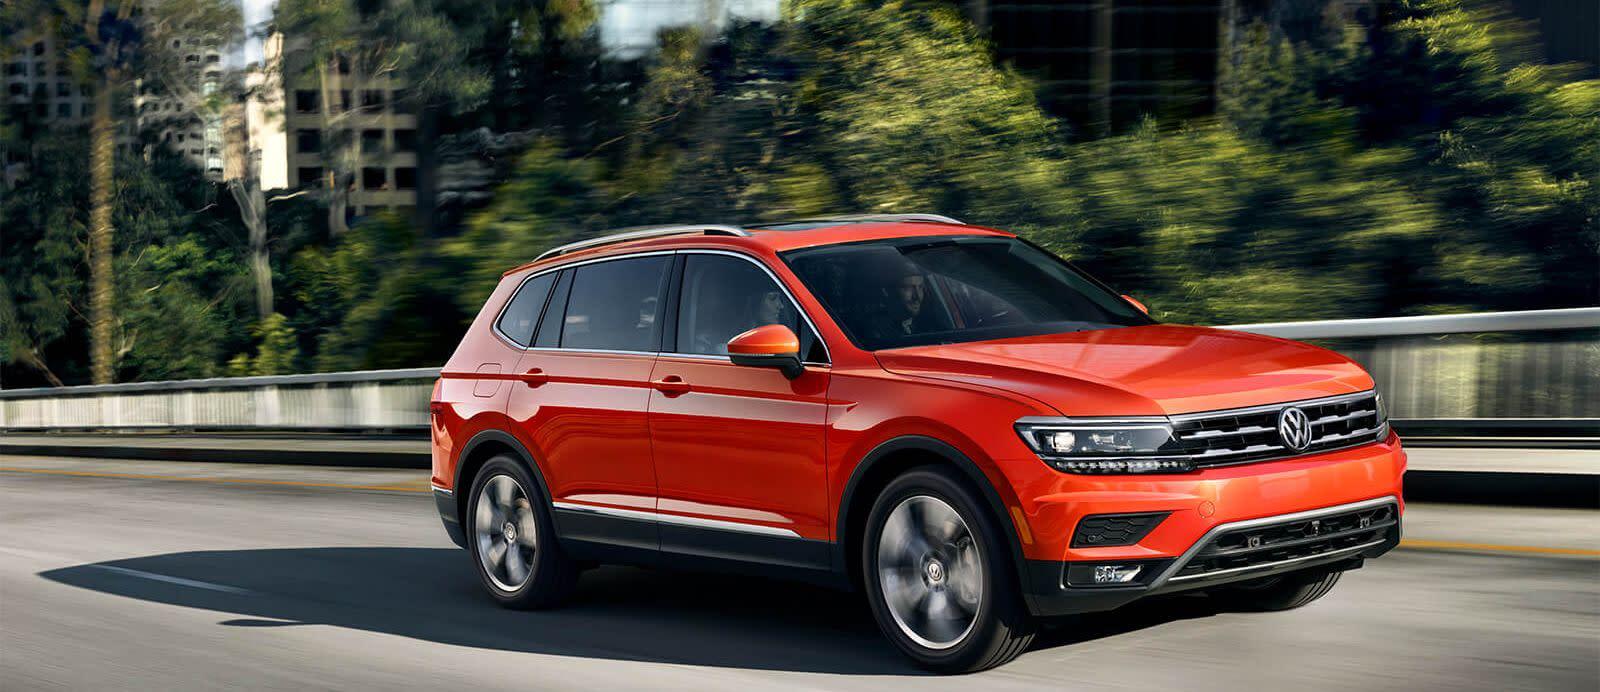 Volkswagen Tiguan 2019 a la venta cerca de Arlington, VA